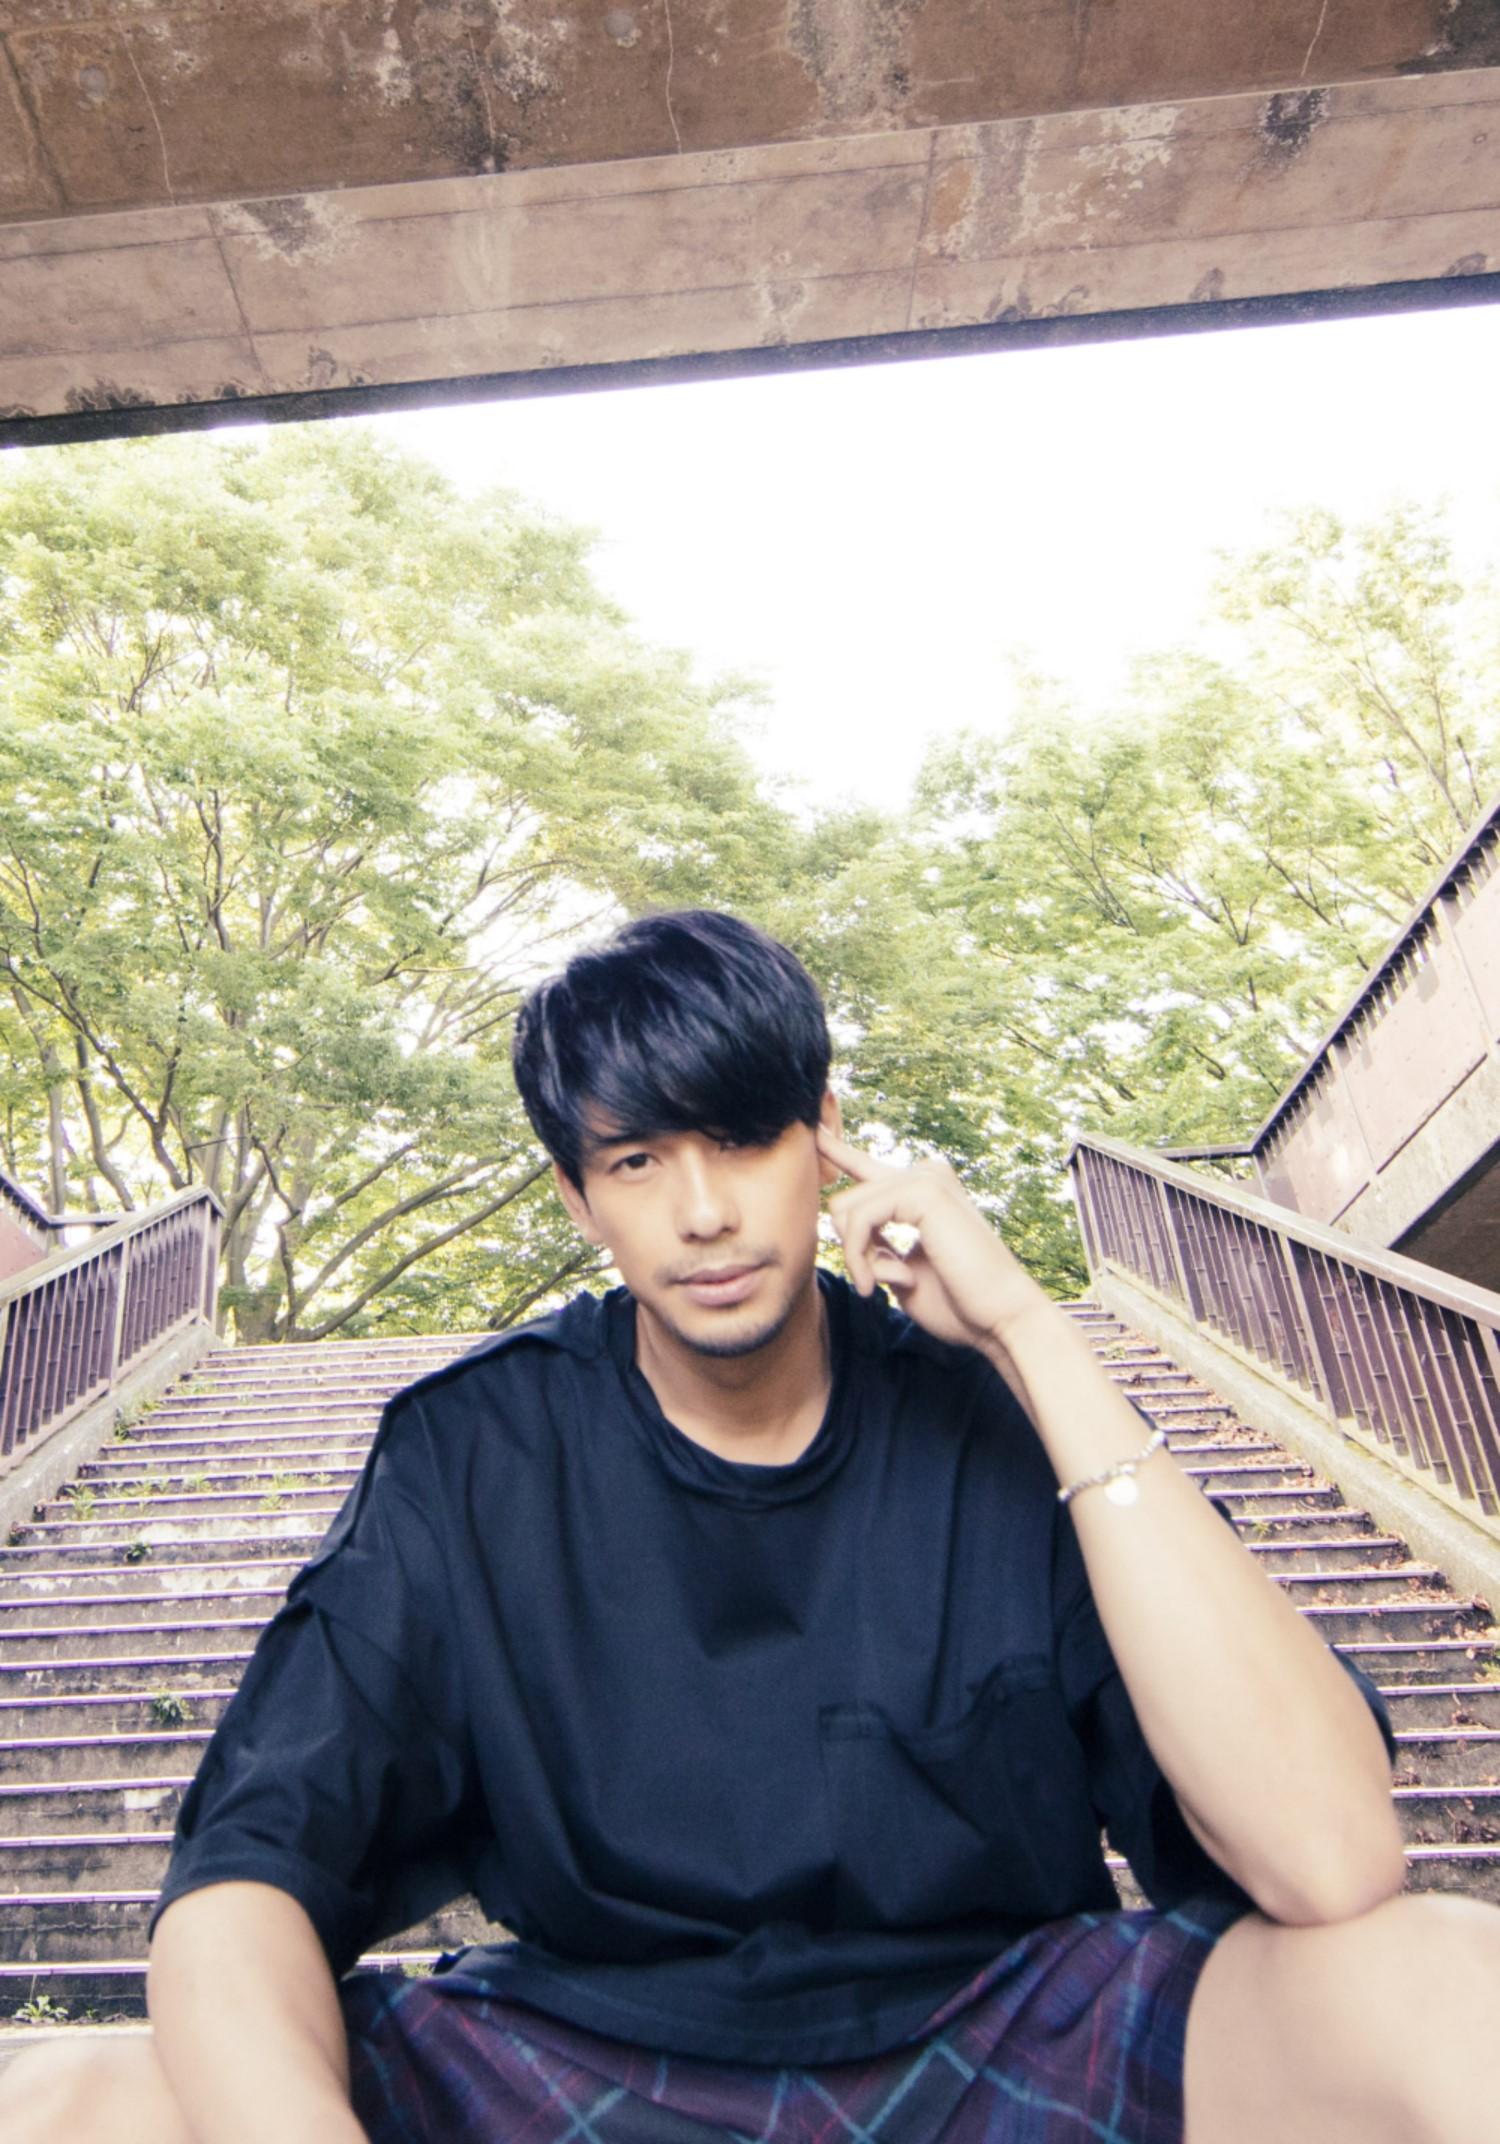 MORISAKI WIN(森崎ウィン)、「d.s.t.m.」配信スタート& 1st ep 『PARADE』 発売記念した衣装展も開催決定